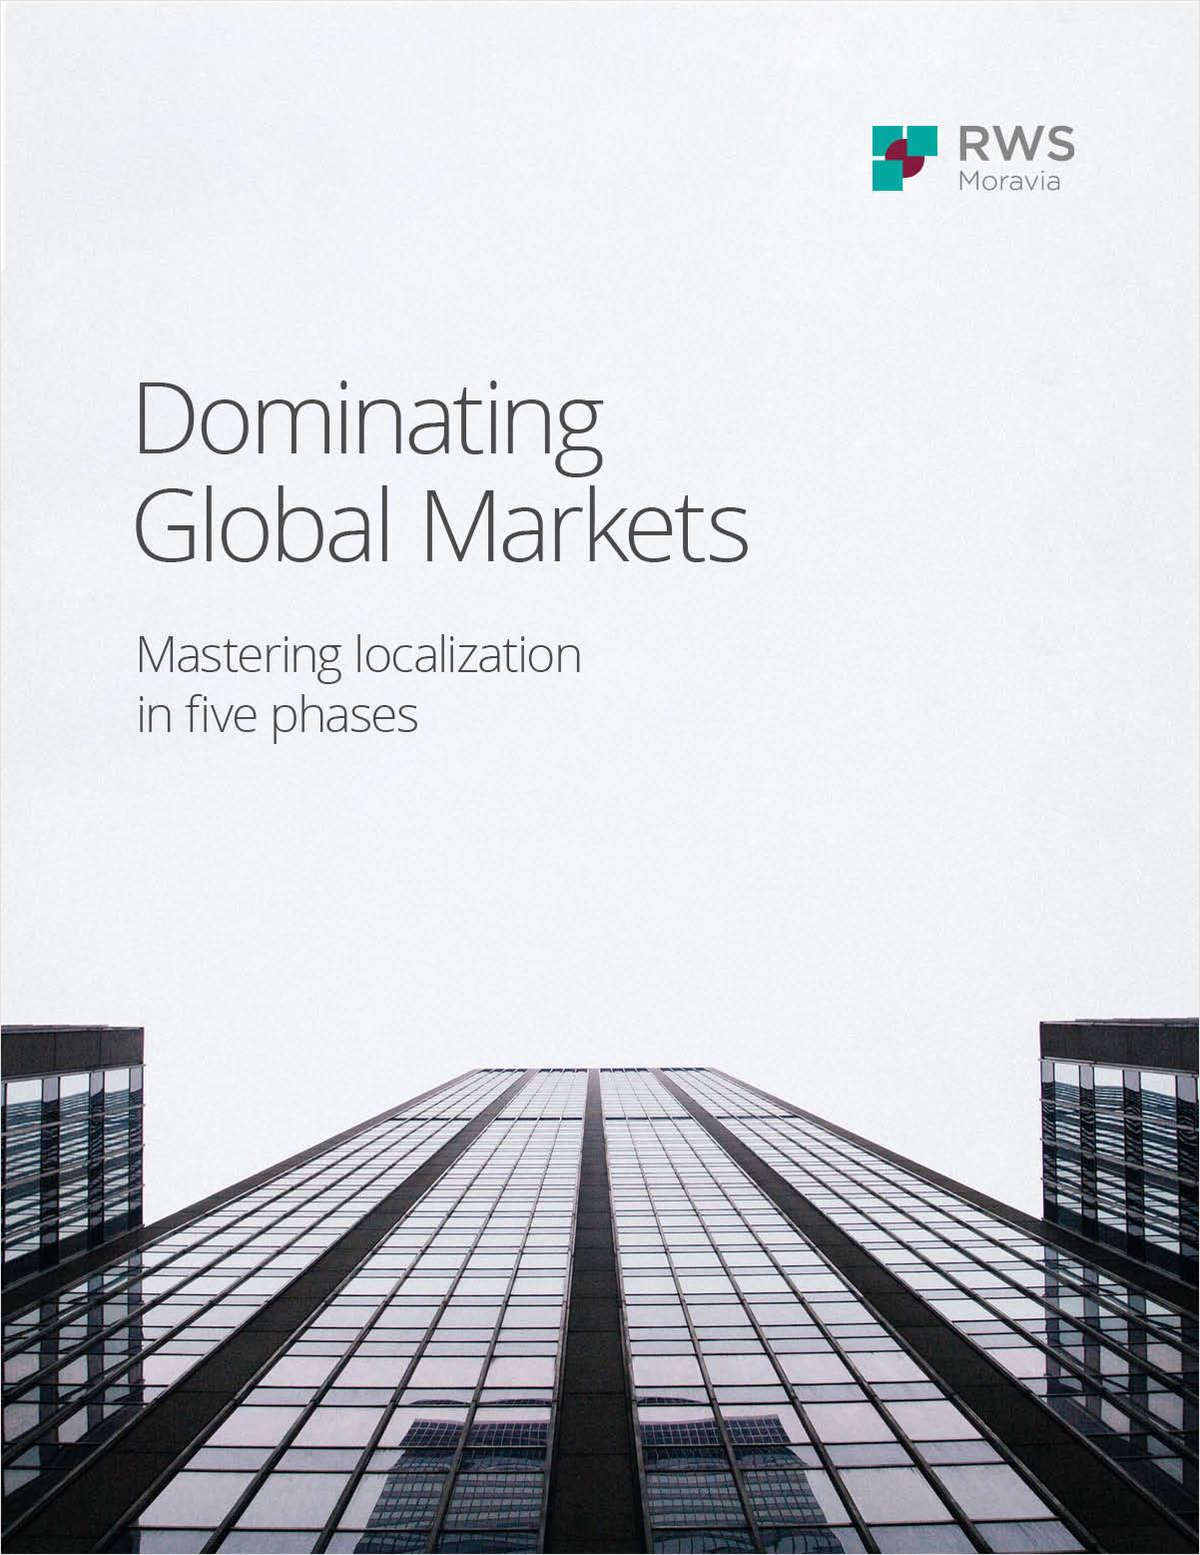 Reach more customers around the world